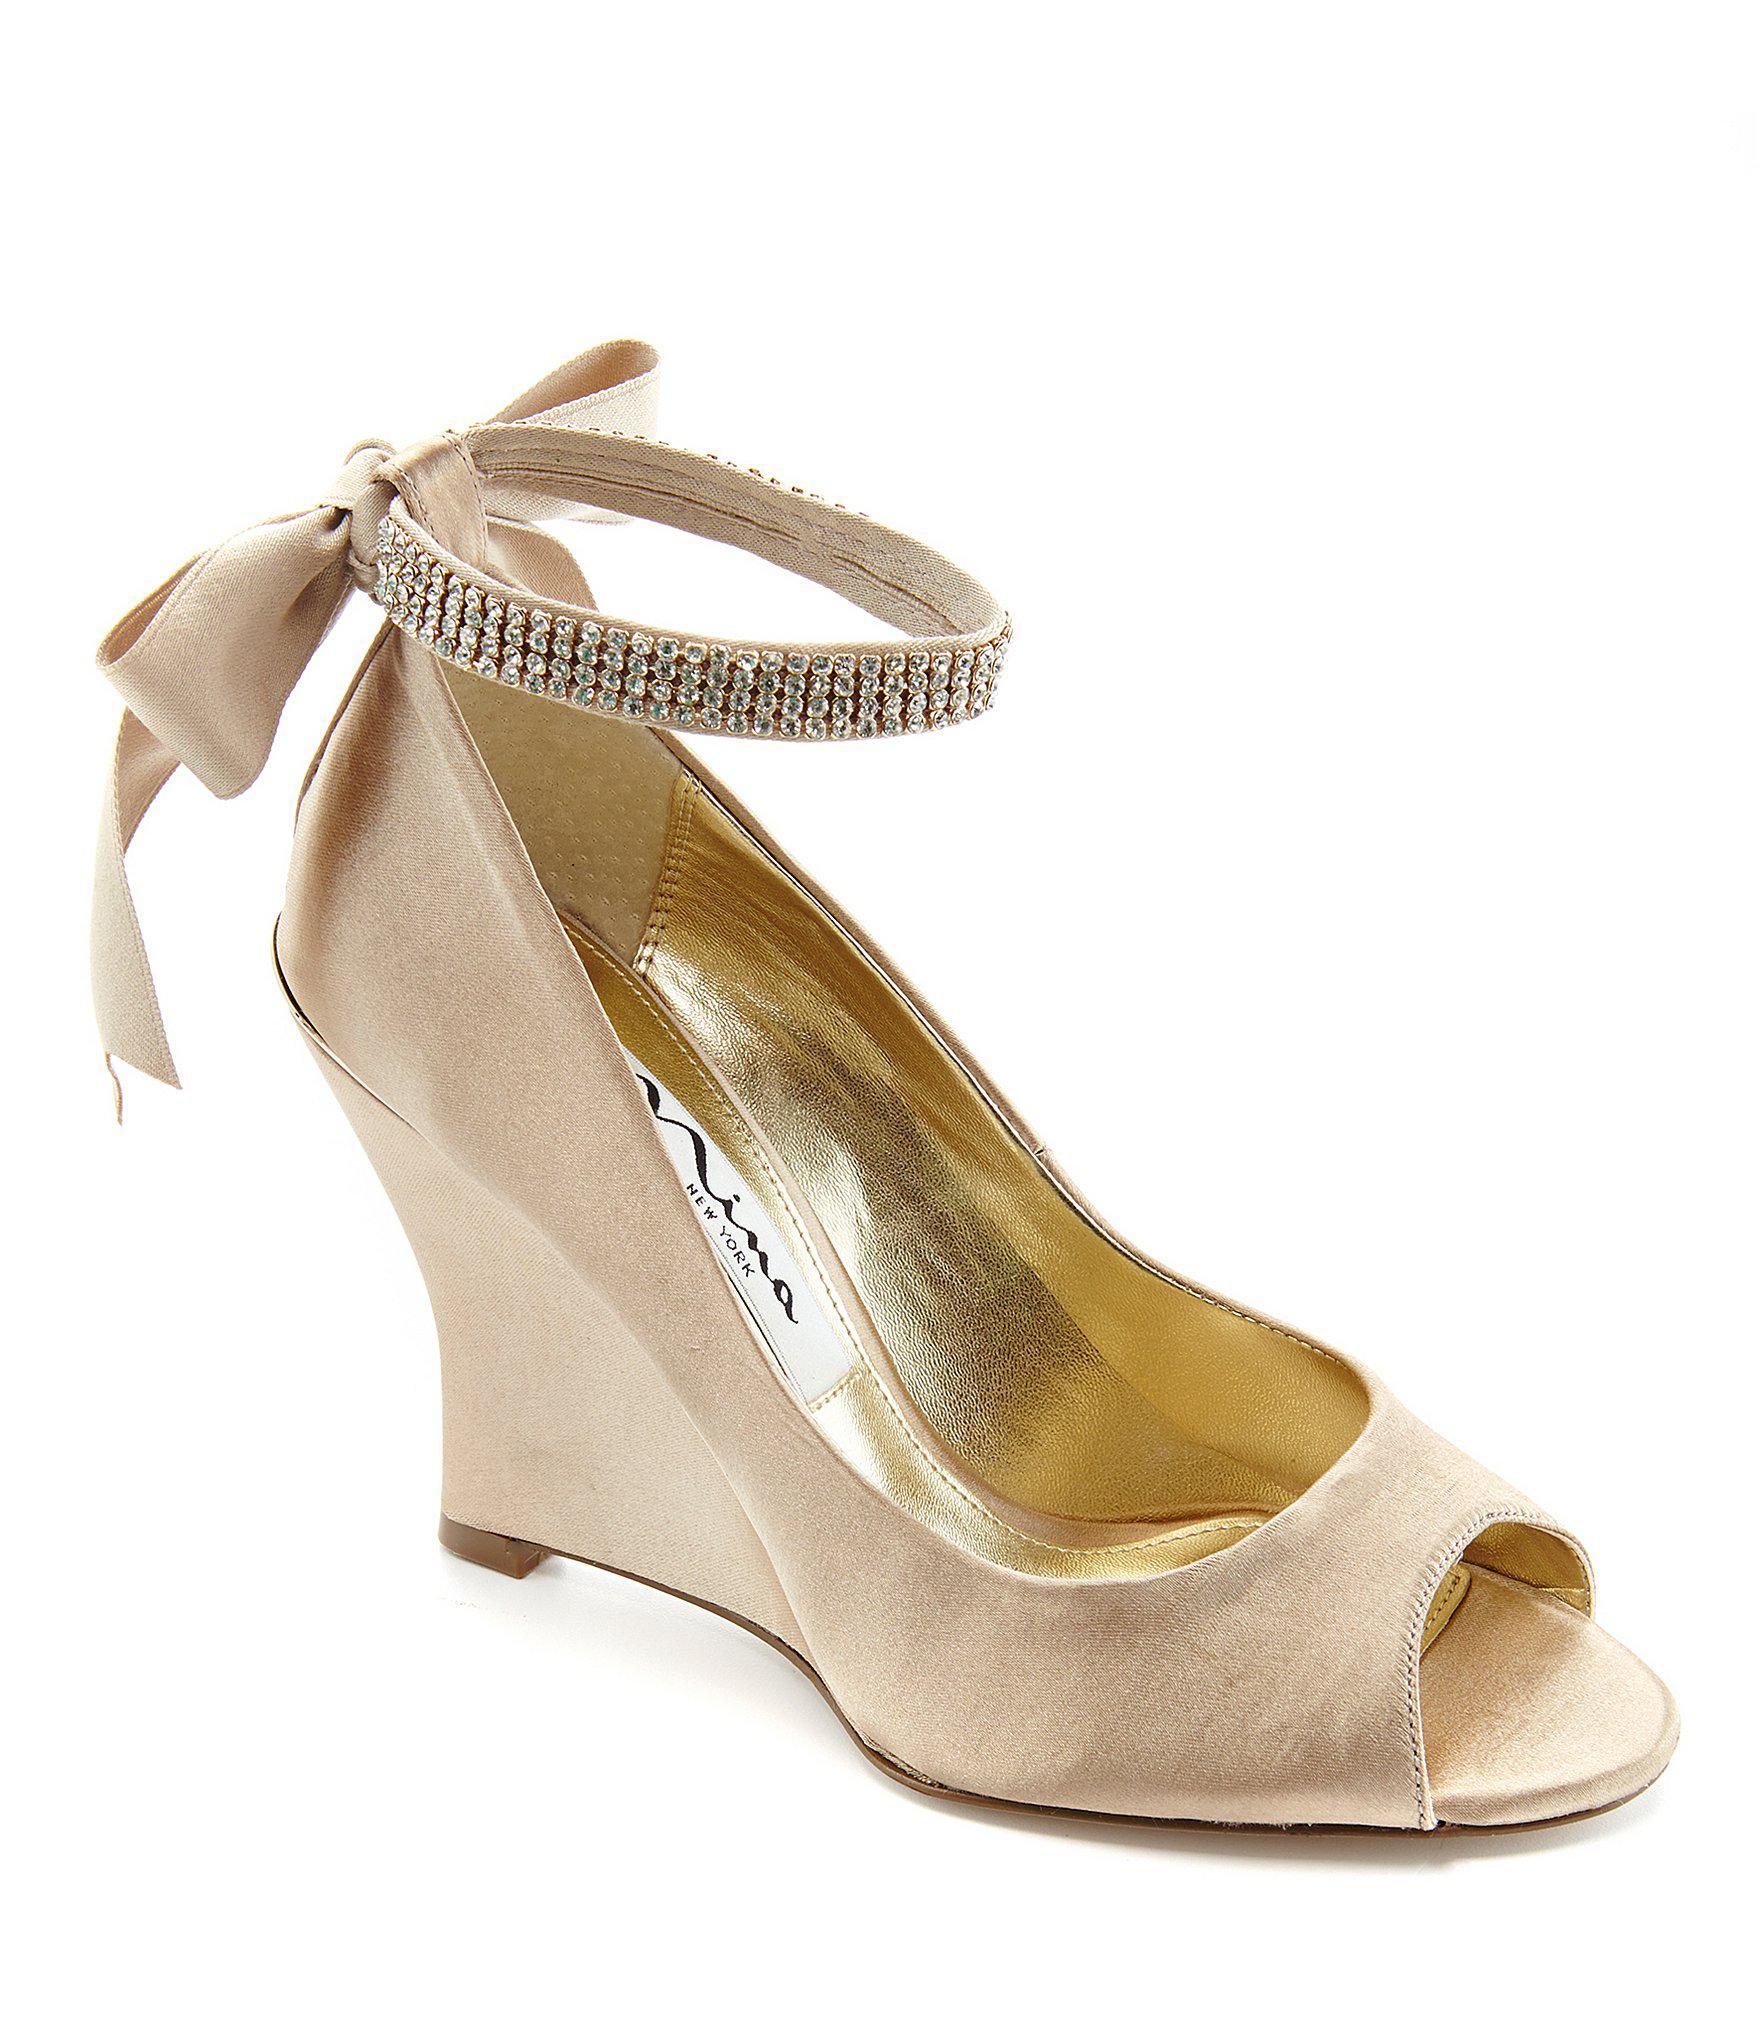 fb814dfe7a3f21 Lyst - Nina Emma Satin Rhinestone Ankle Strap Peep-toe Wedges in Natural